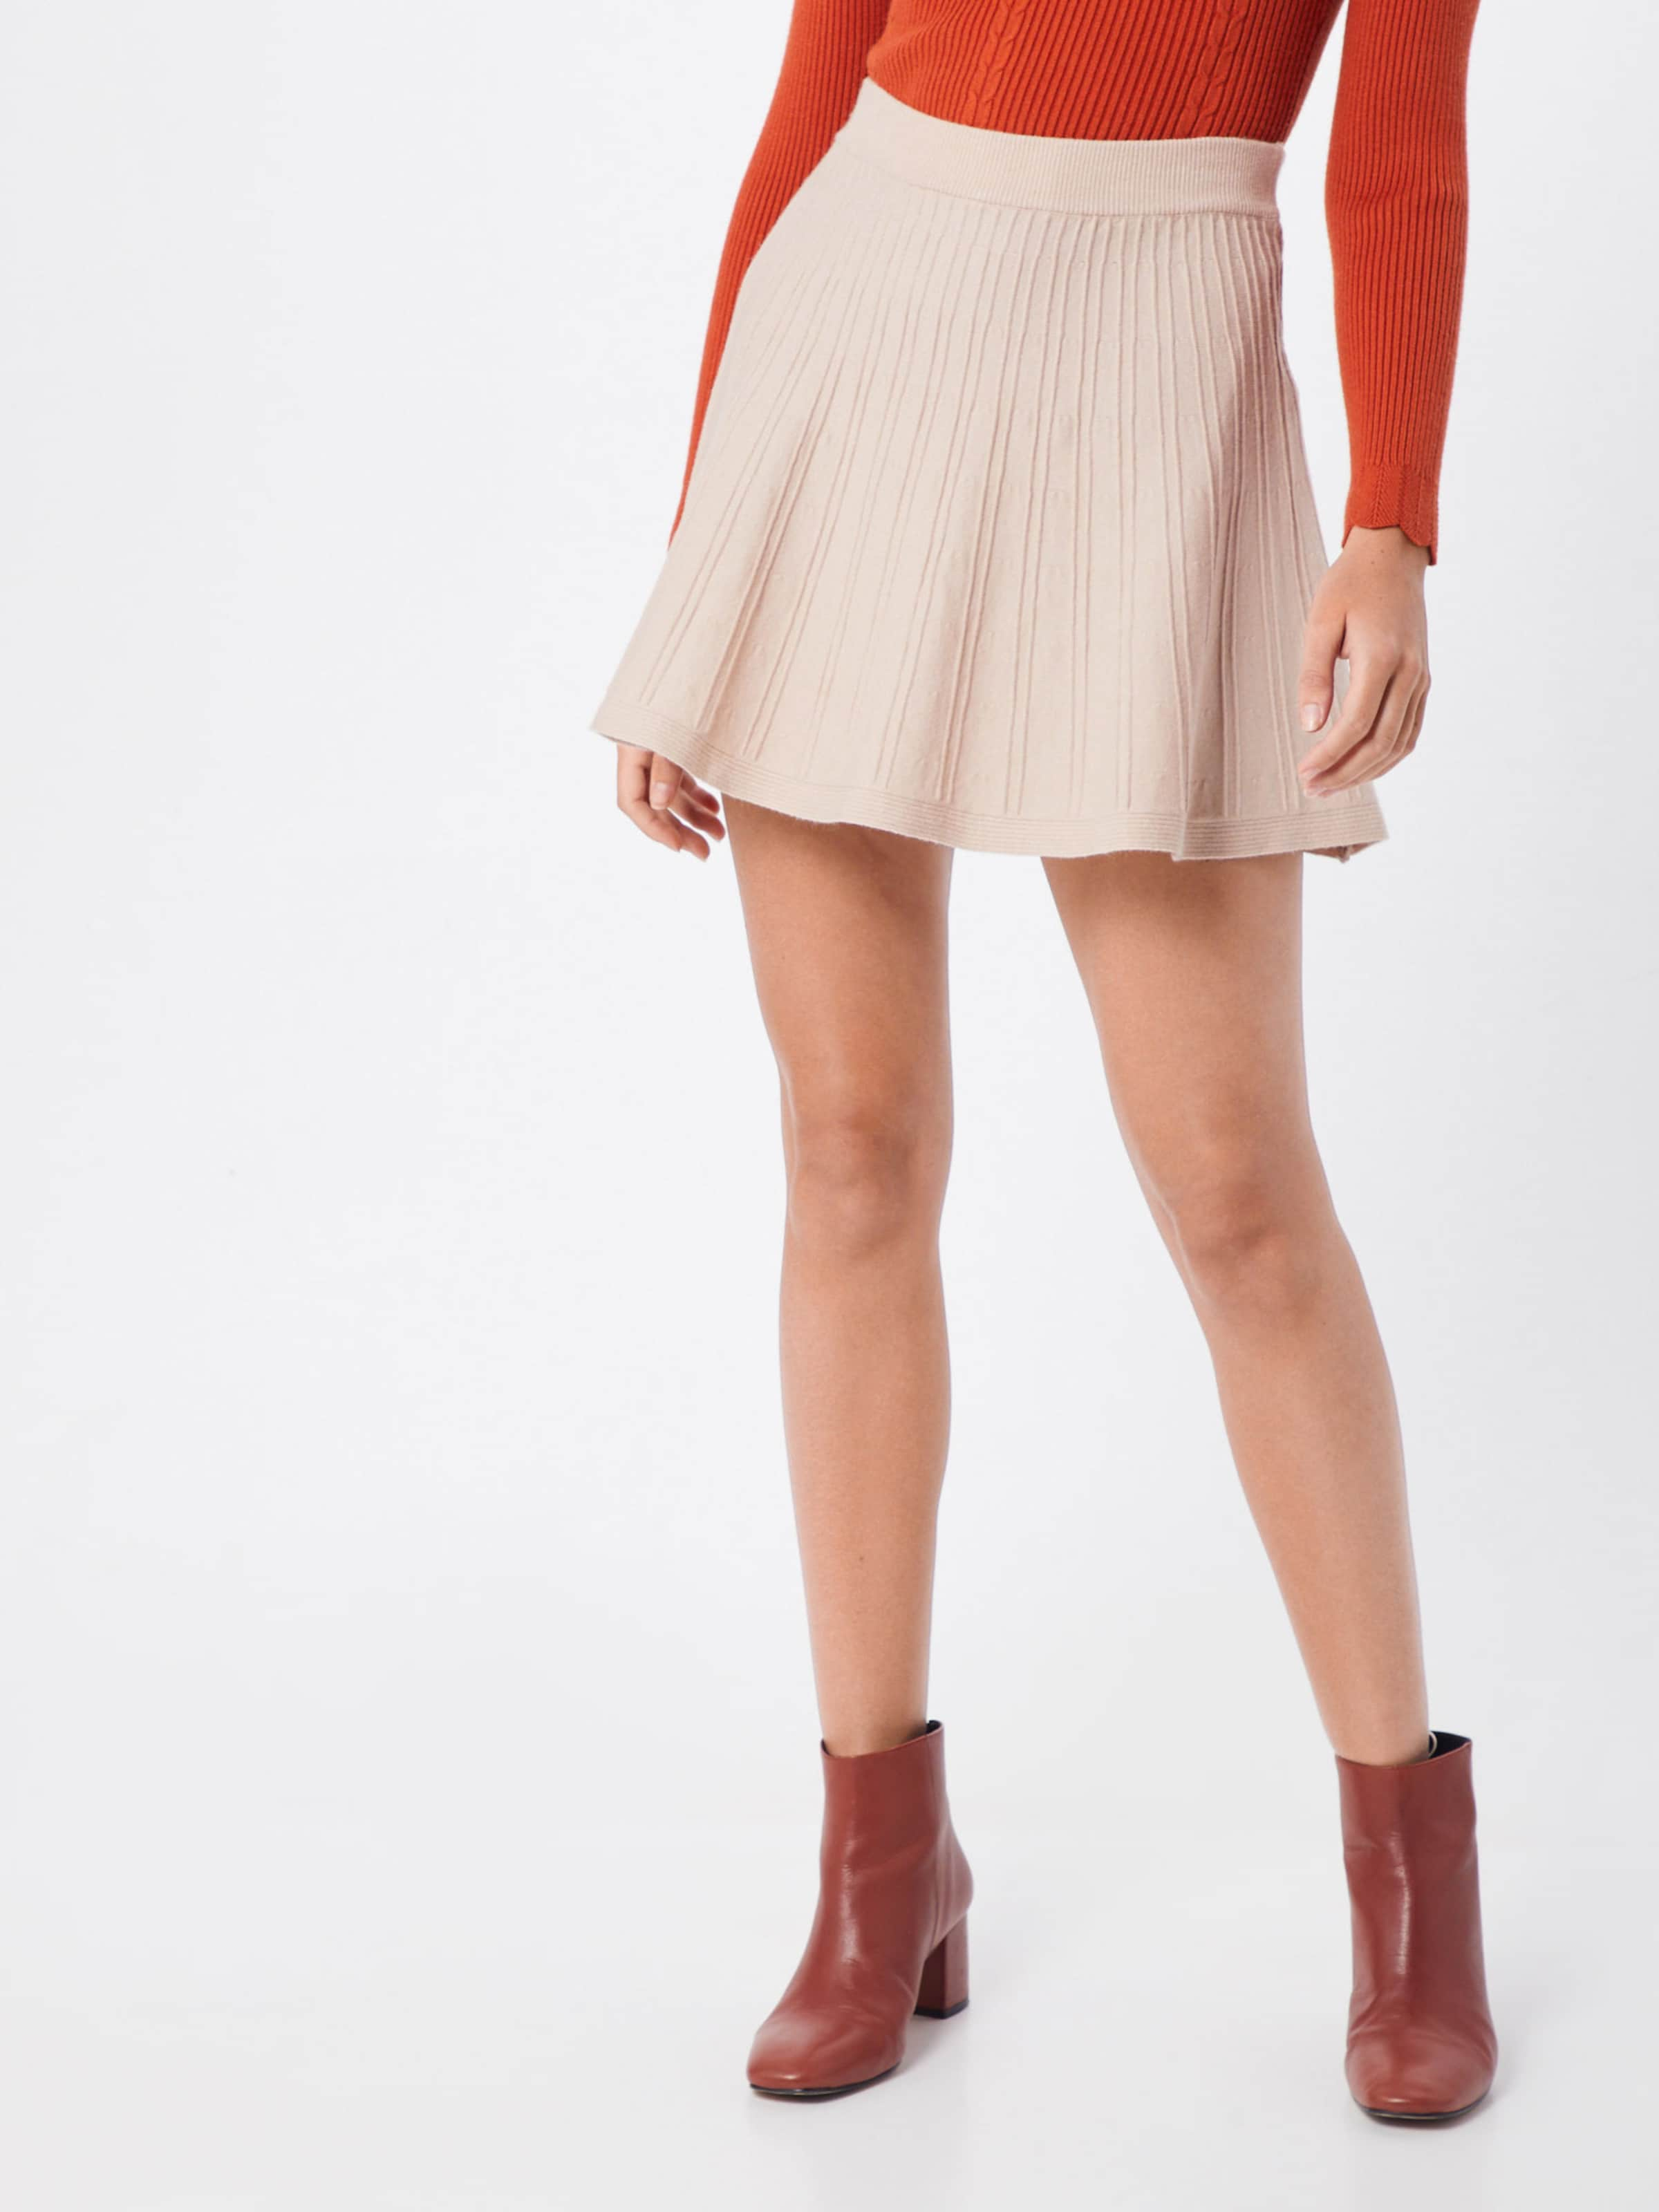 'flipside Parallel En Skirt' Lines Jupe Nude m8OvNPnwy0